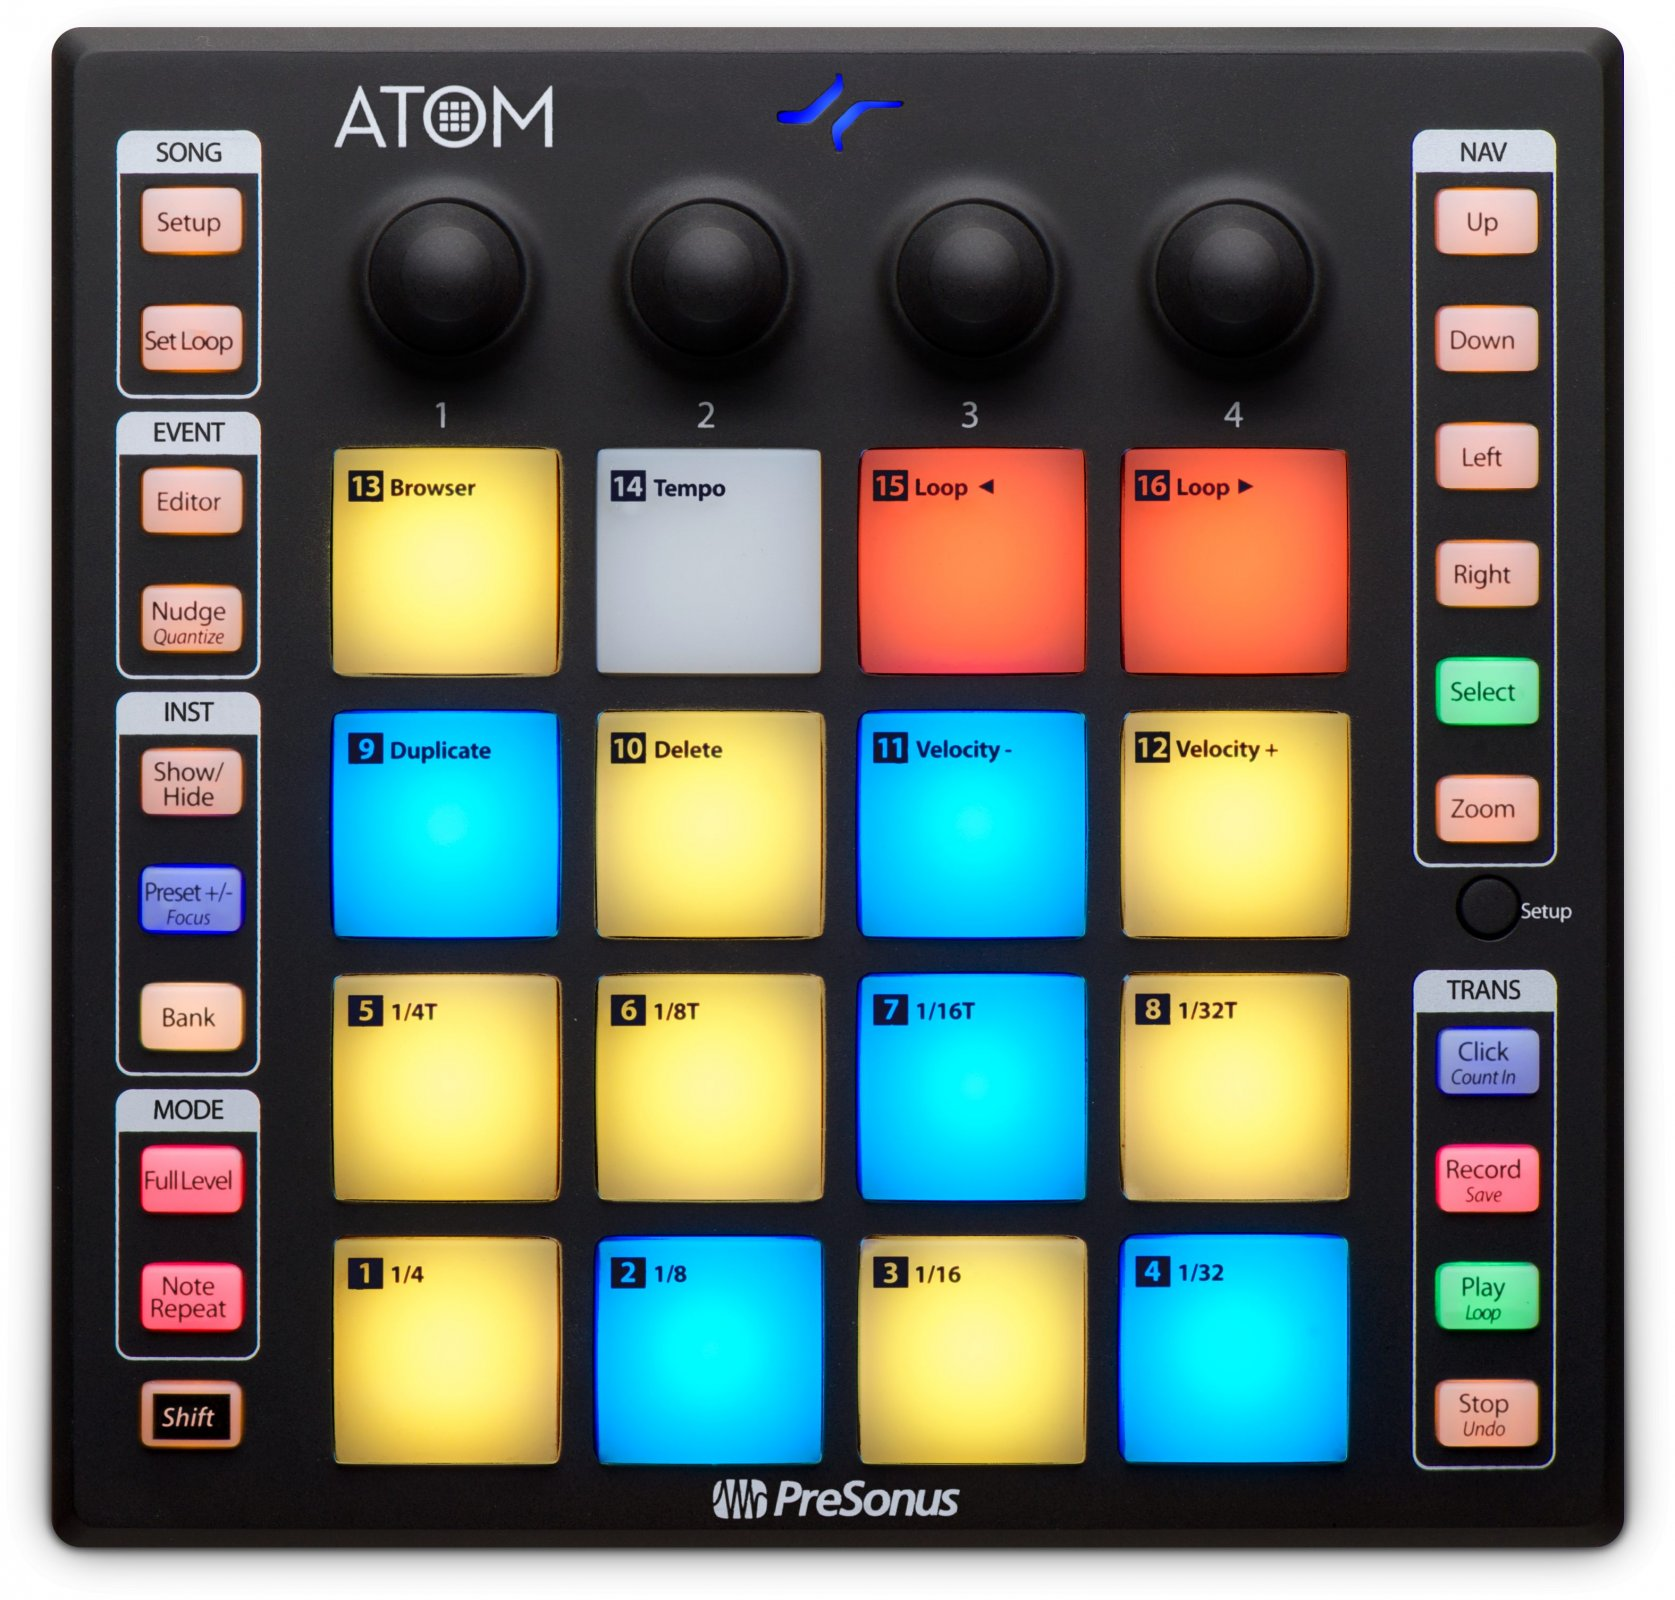 Presonus ATOM 16-pad USB MIDI Controller, Studio One Artist